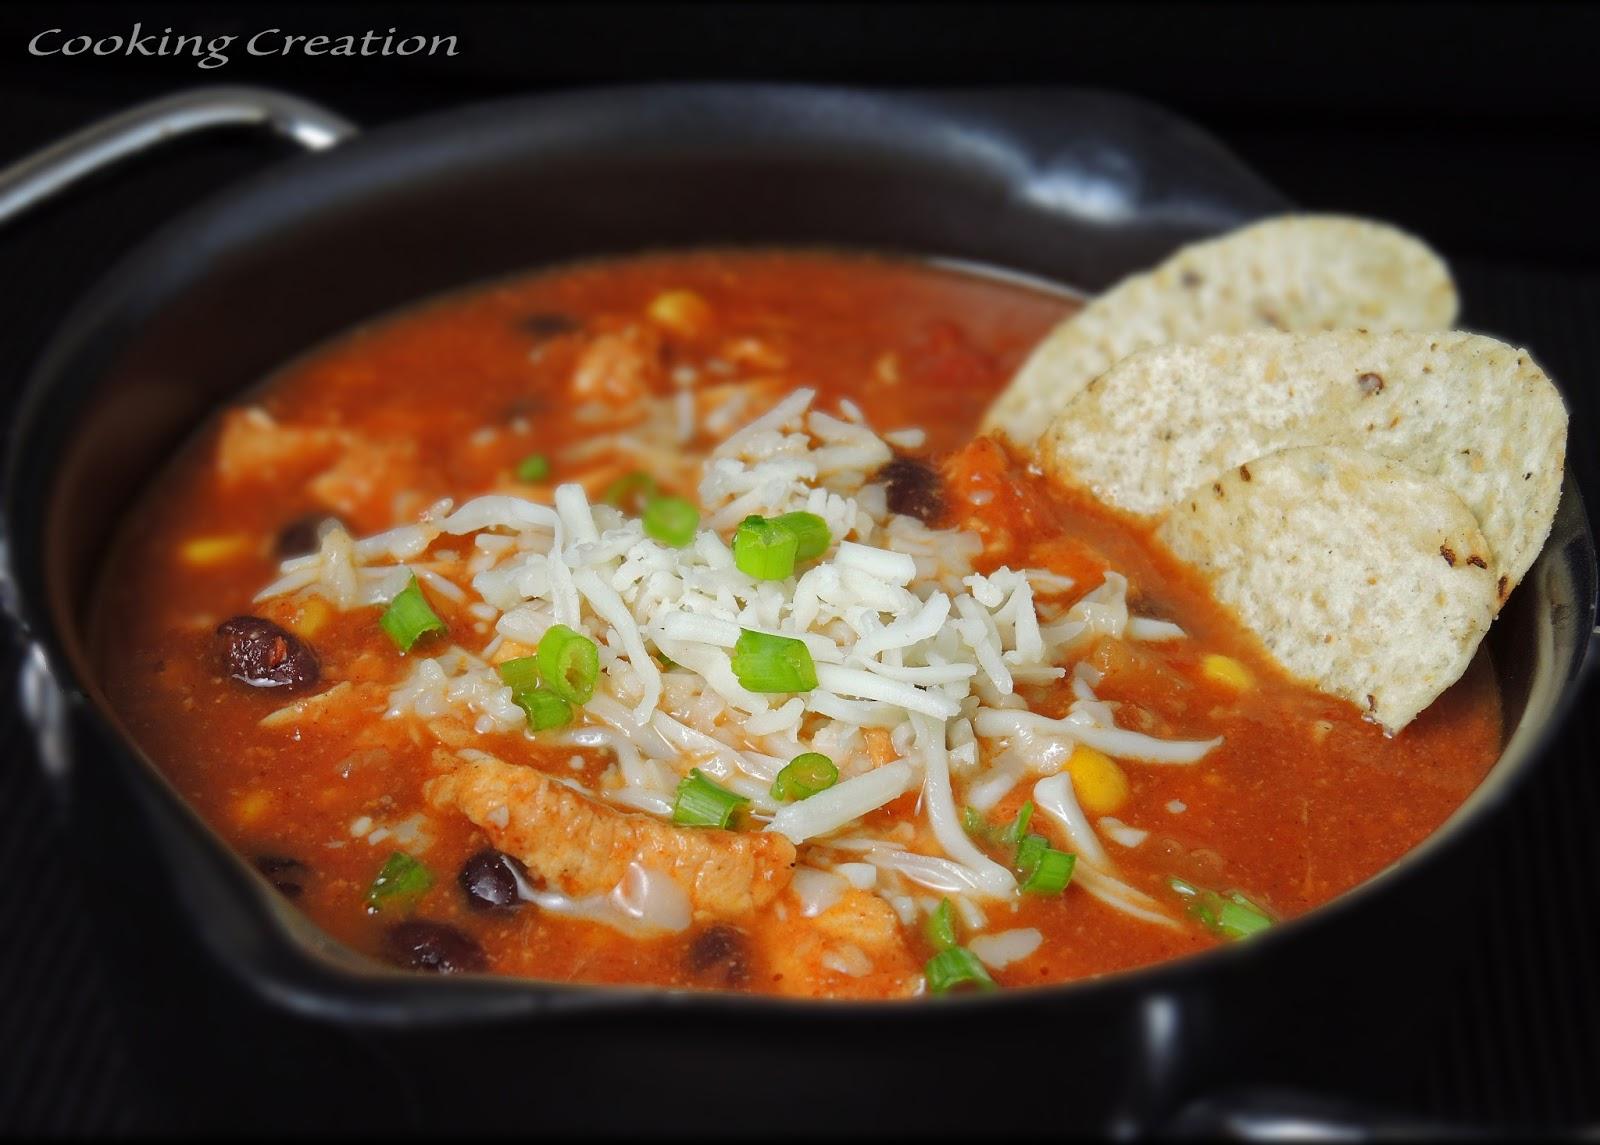 Cooking Creation: Slow Cooker Spicy Chicken Tortilla Stew